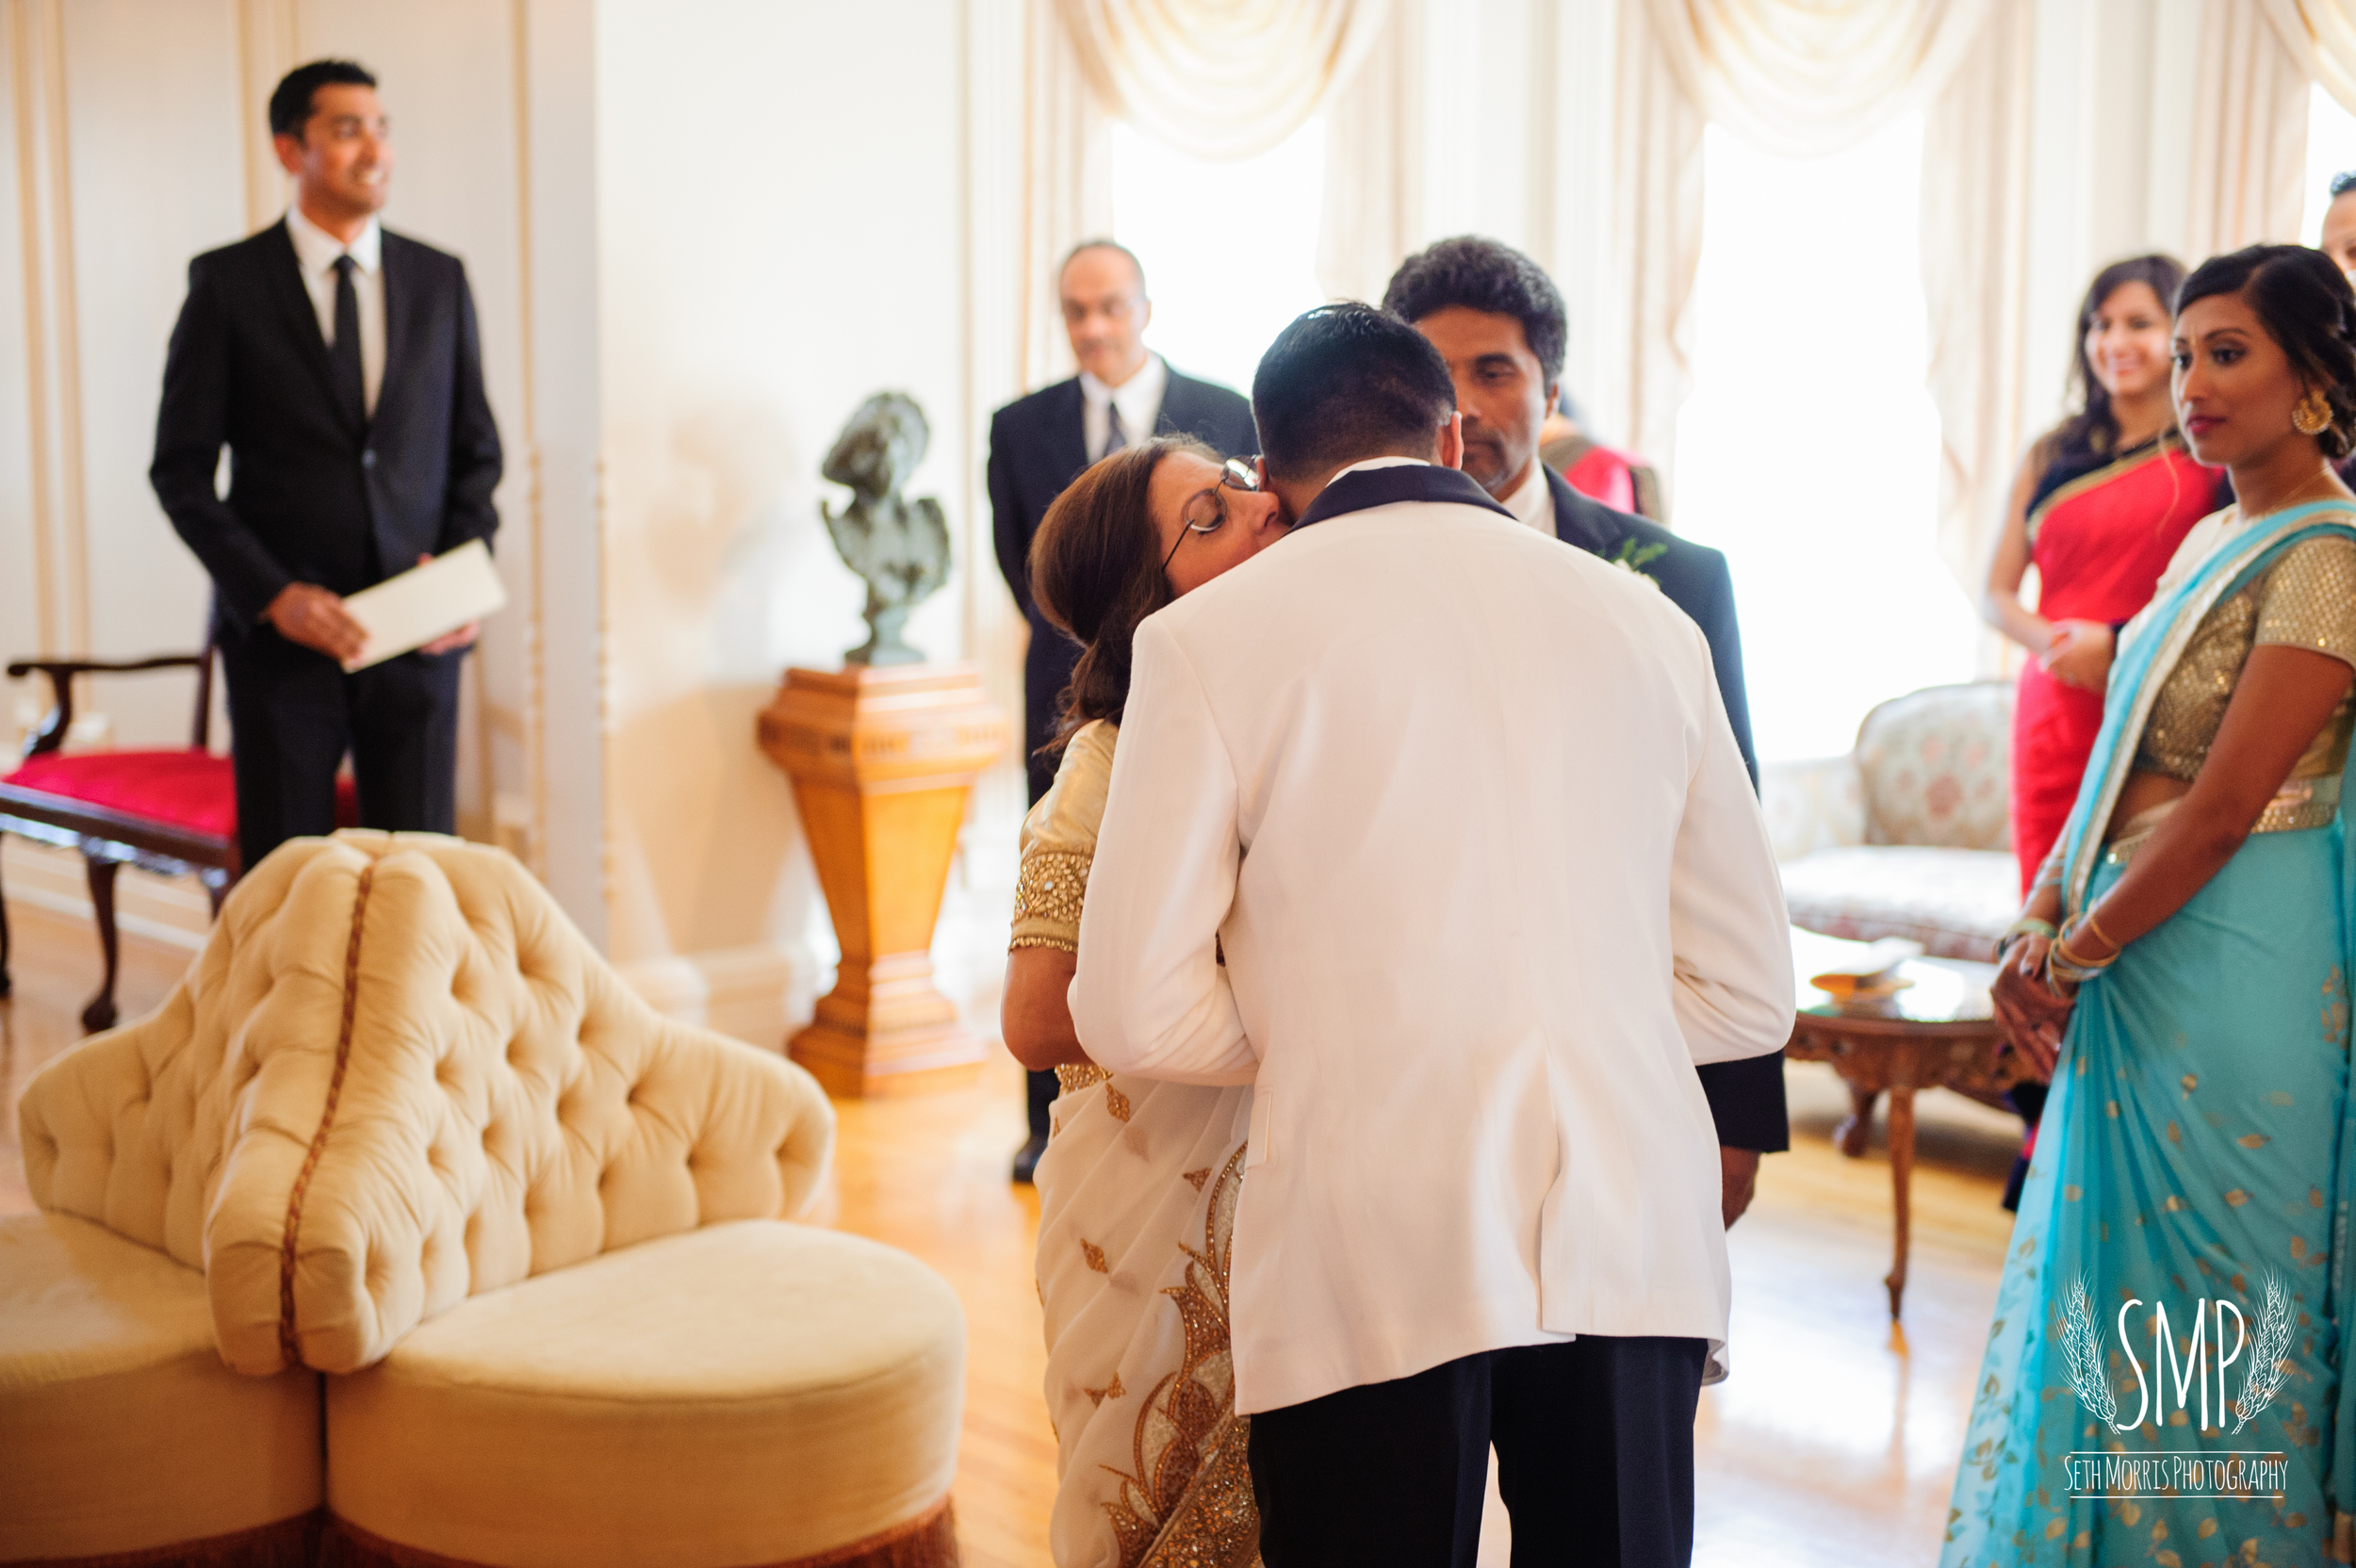 same-sex-wedding-photographer-chicago-illinois-69.jpg